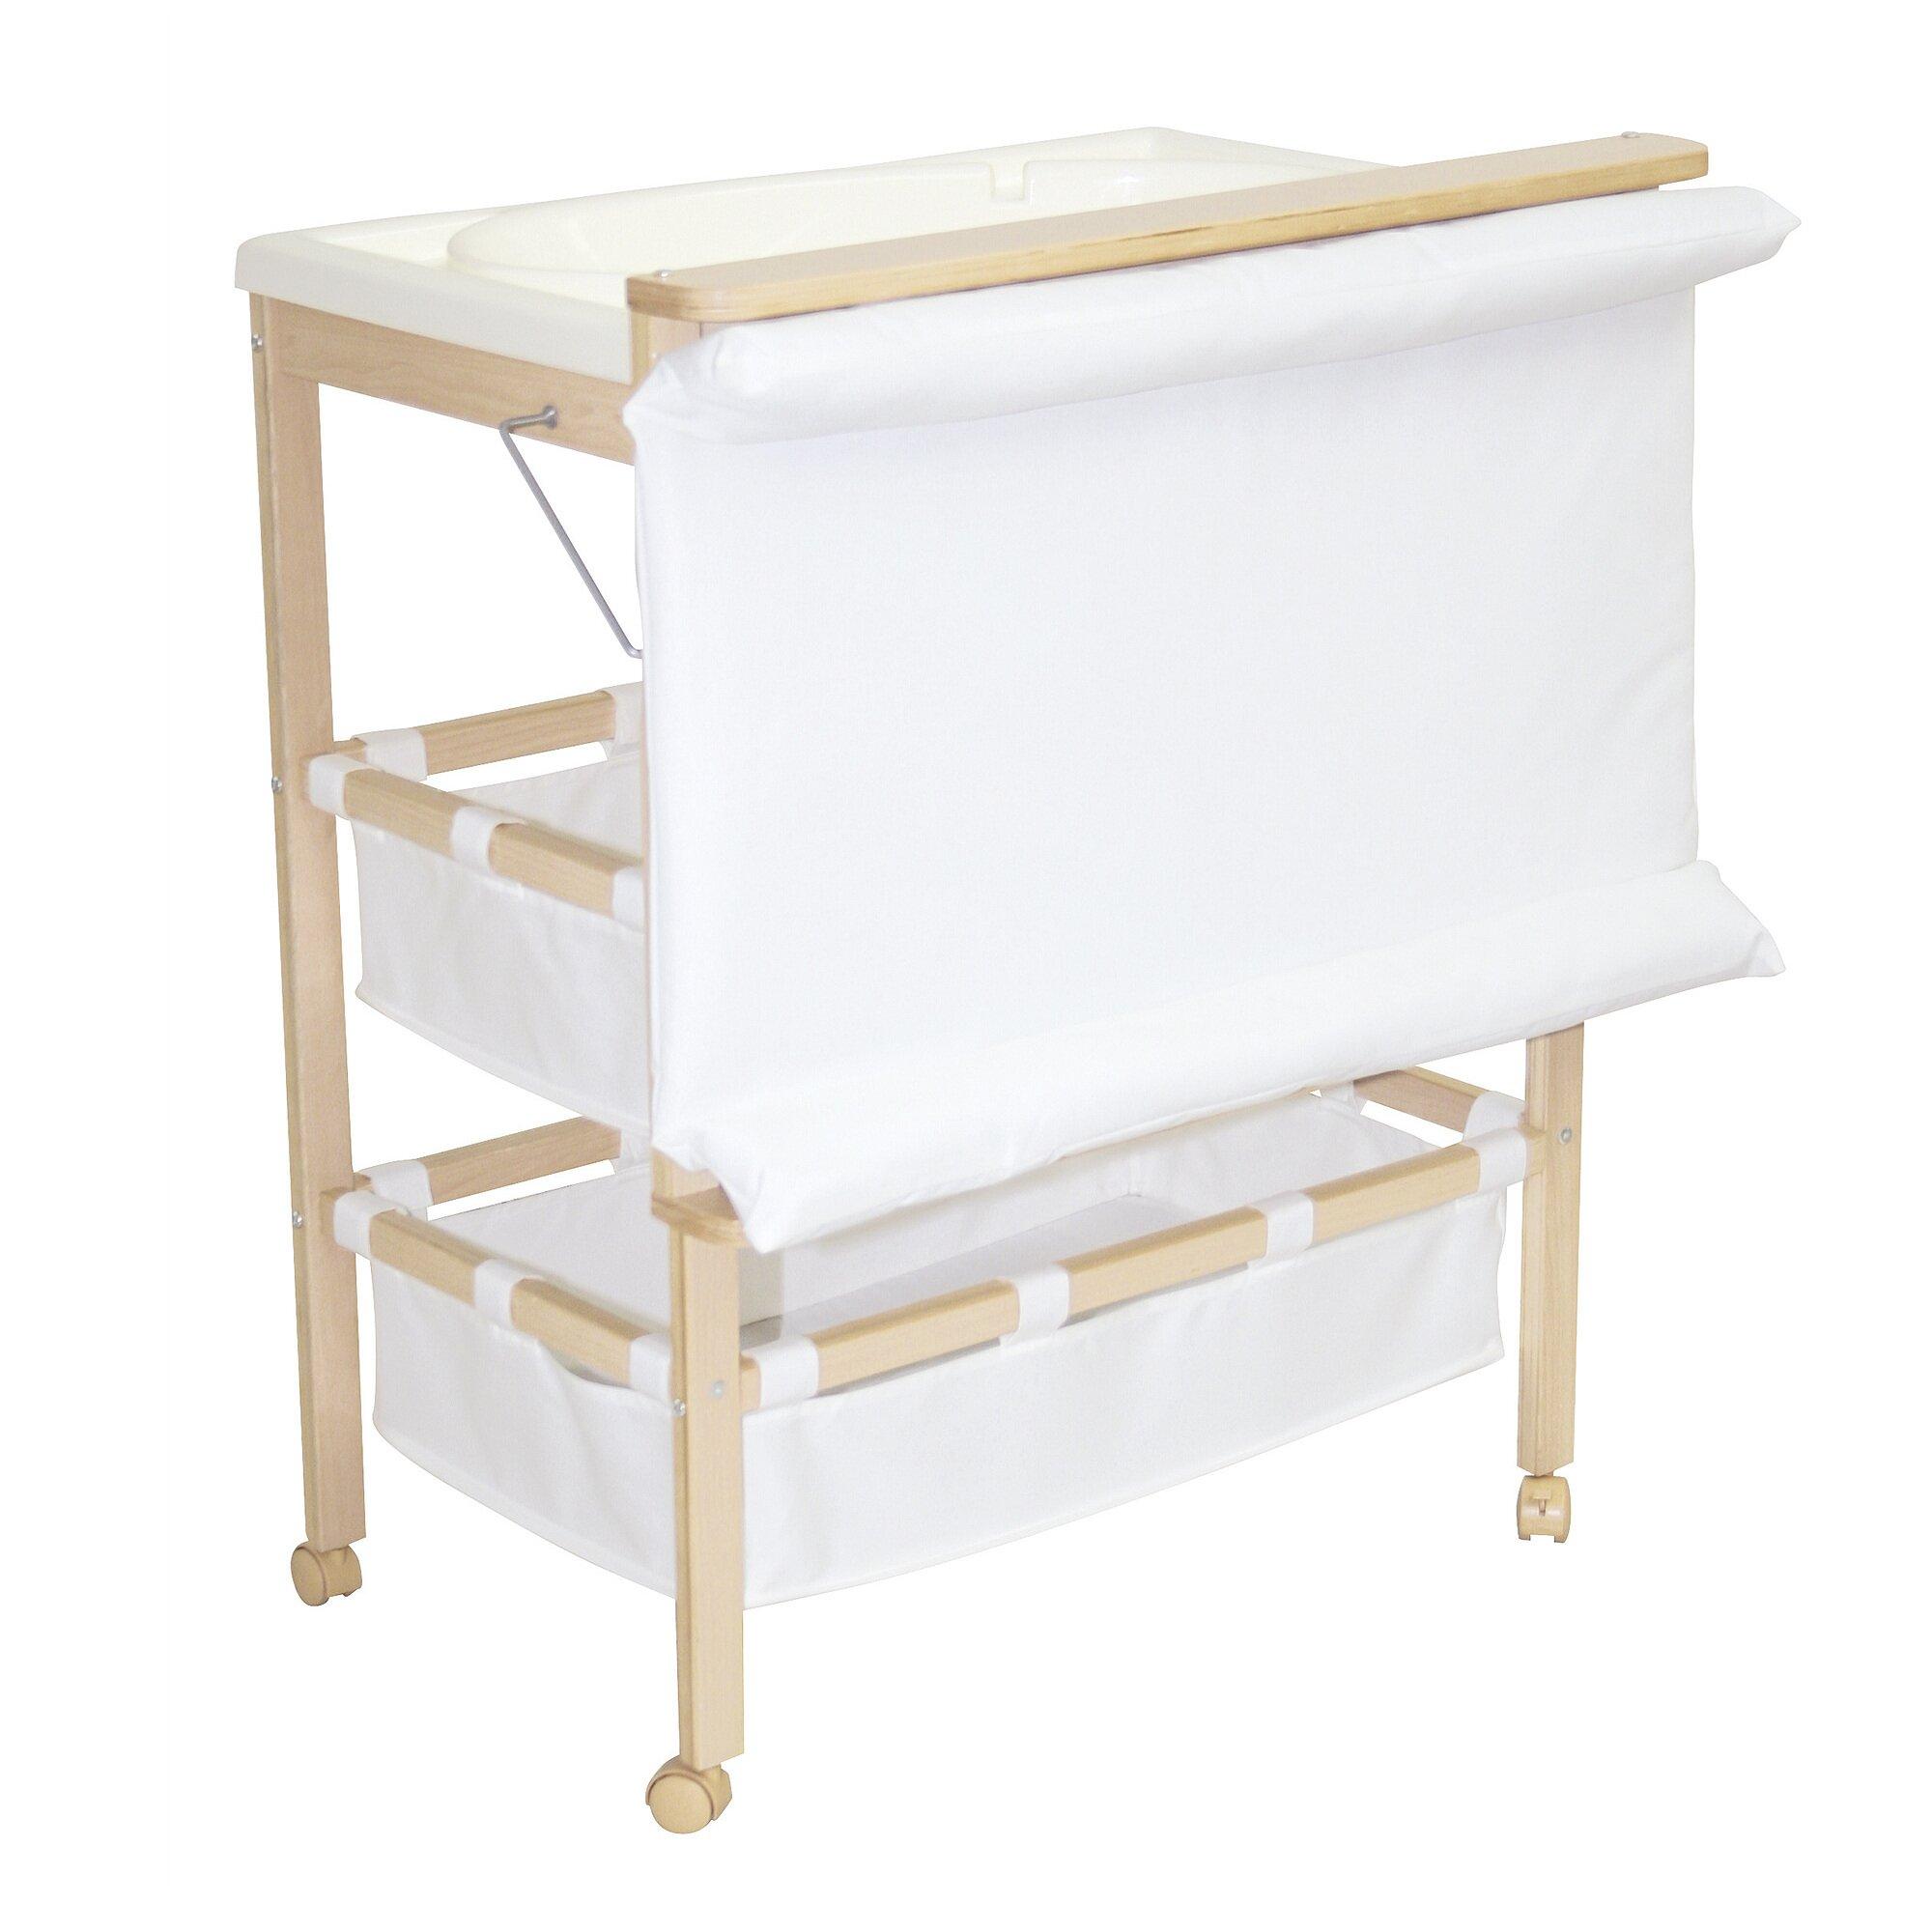 bade und sandmuschel orange preis bild rating. Black Bedroom Furniture Sets. Home Design Ideas